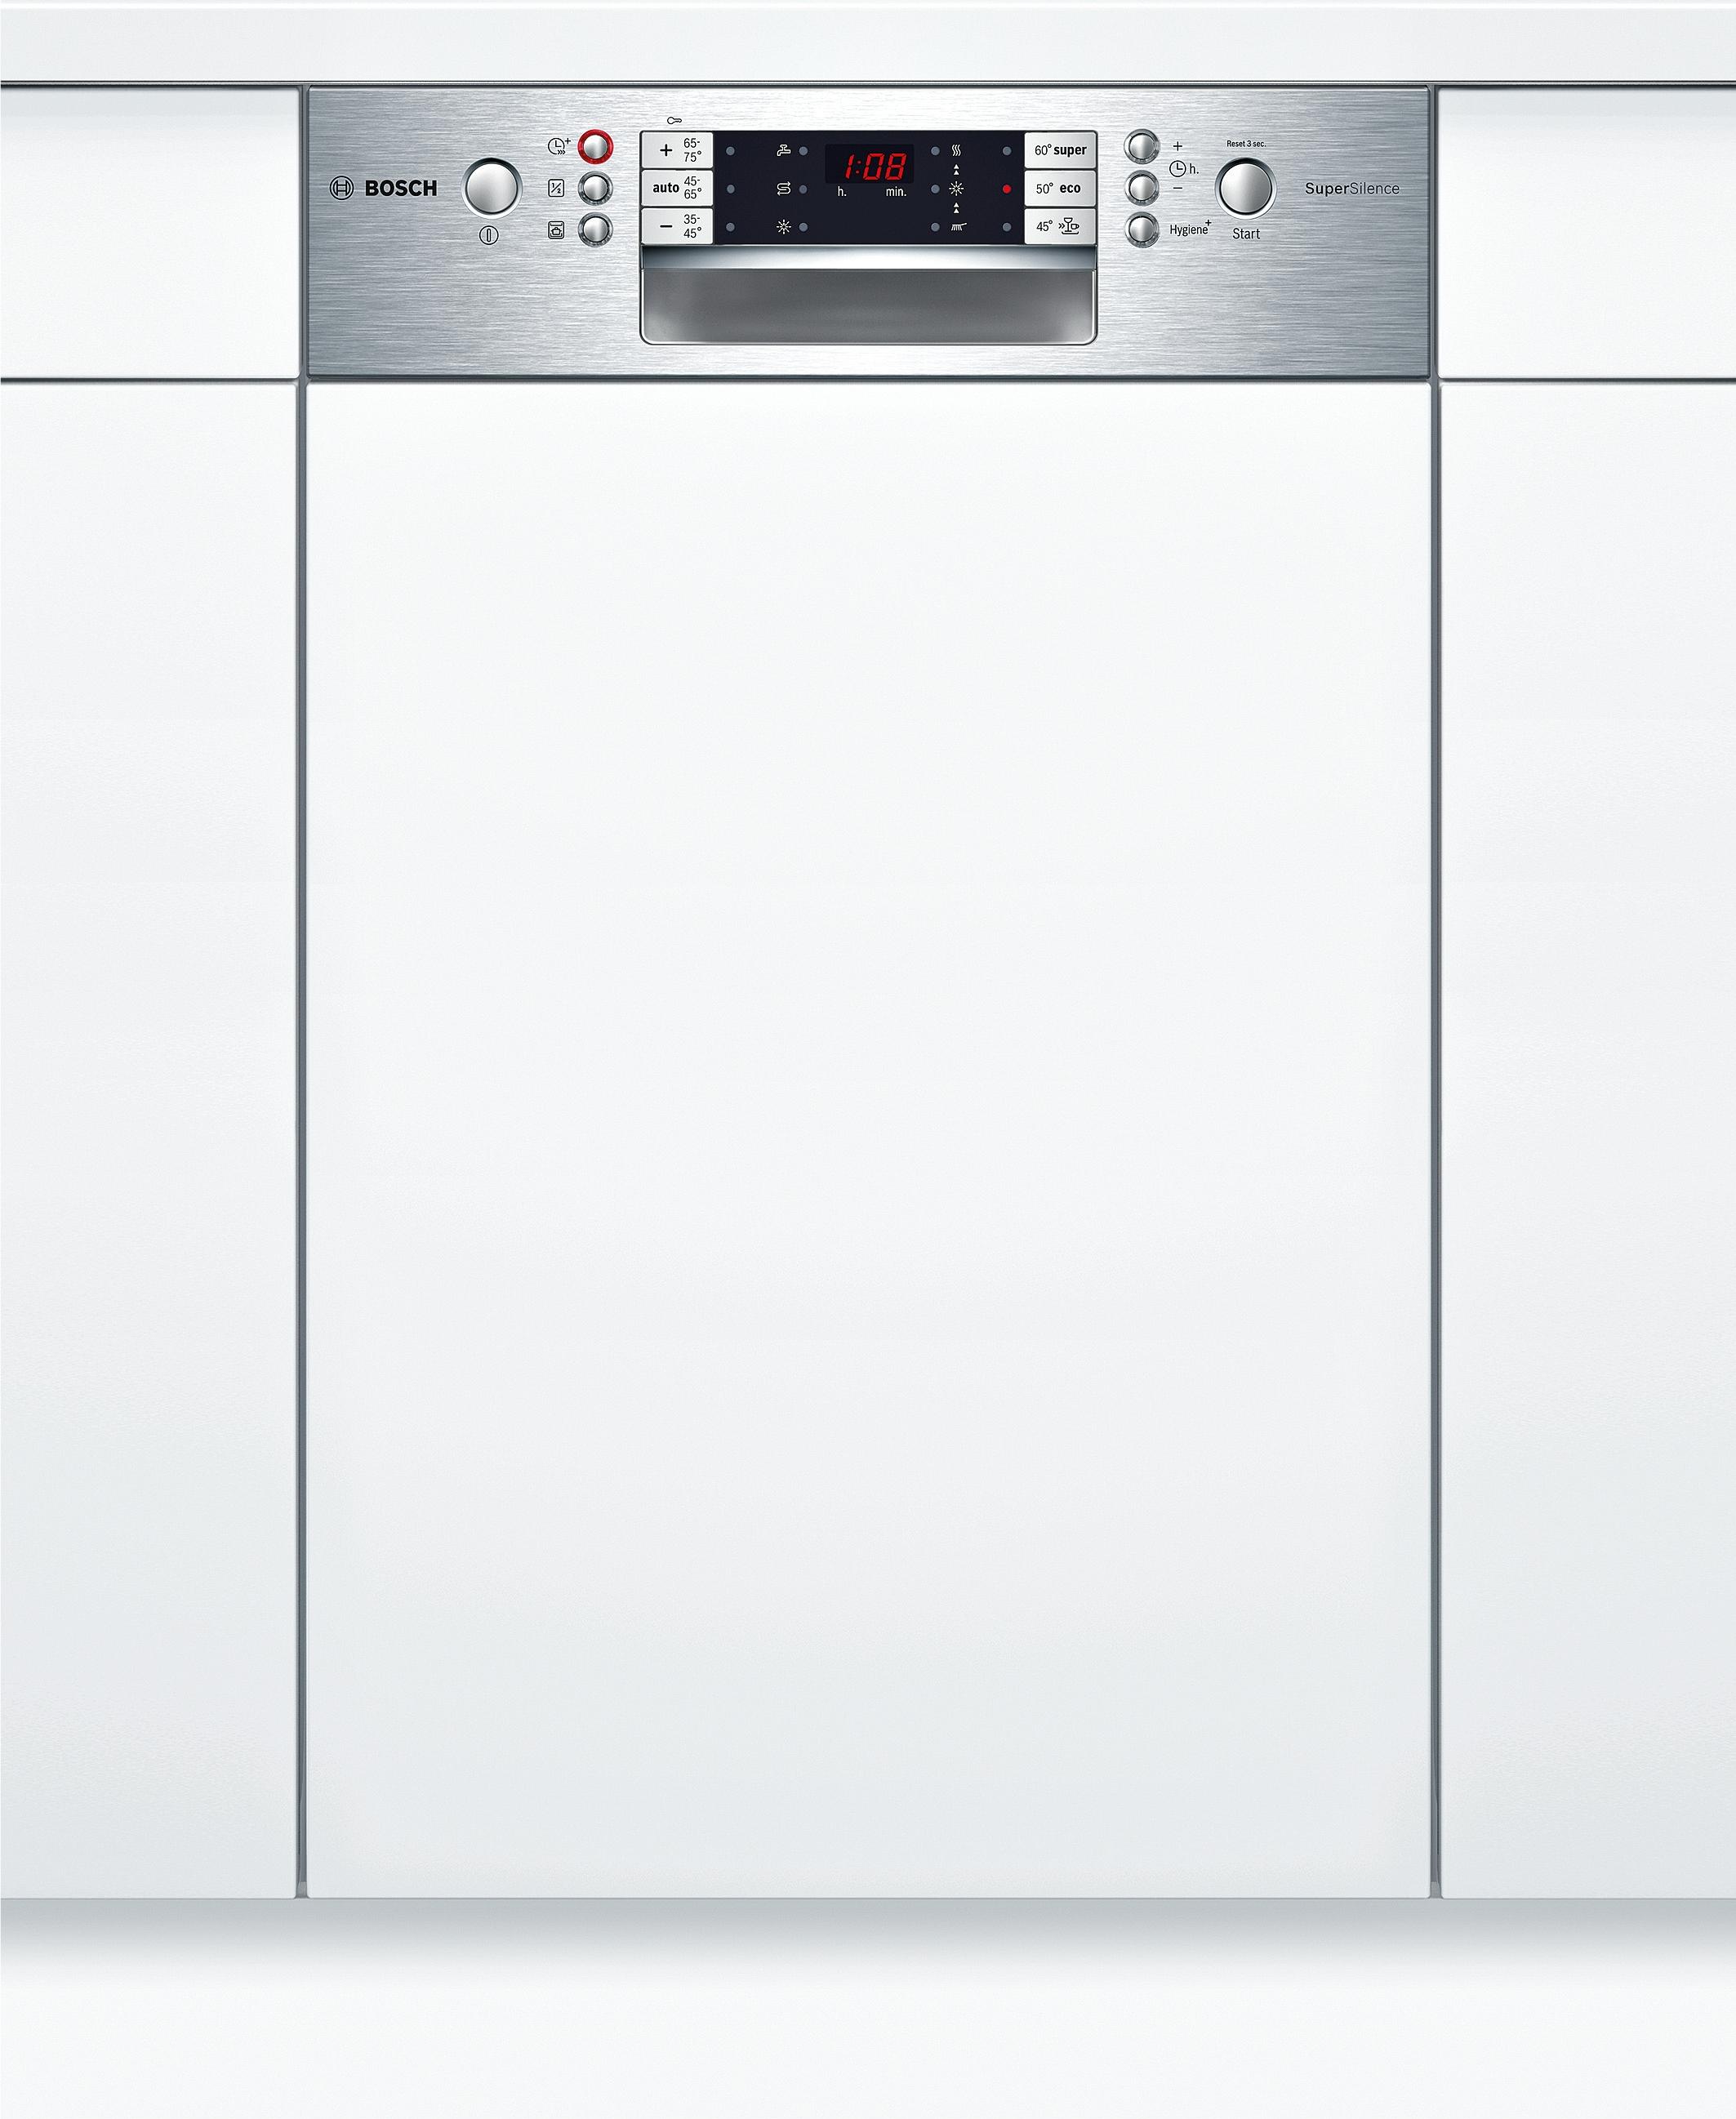 45 cm schmale Geschirrspüler | www.cucine24.com